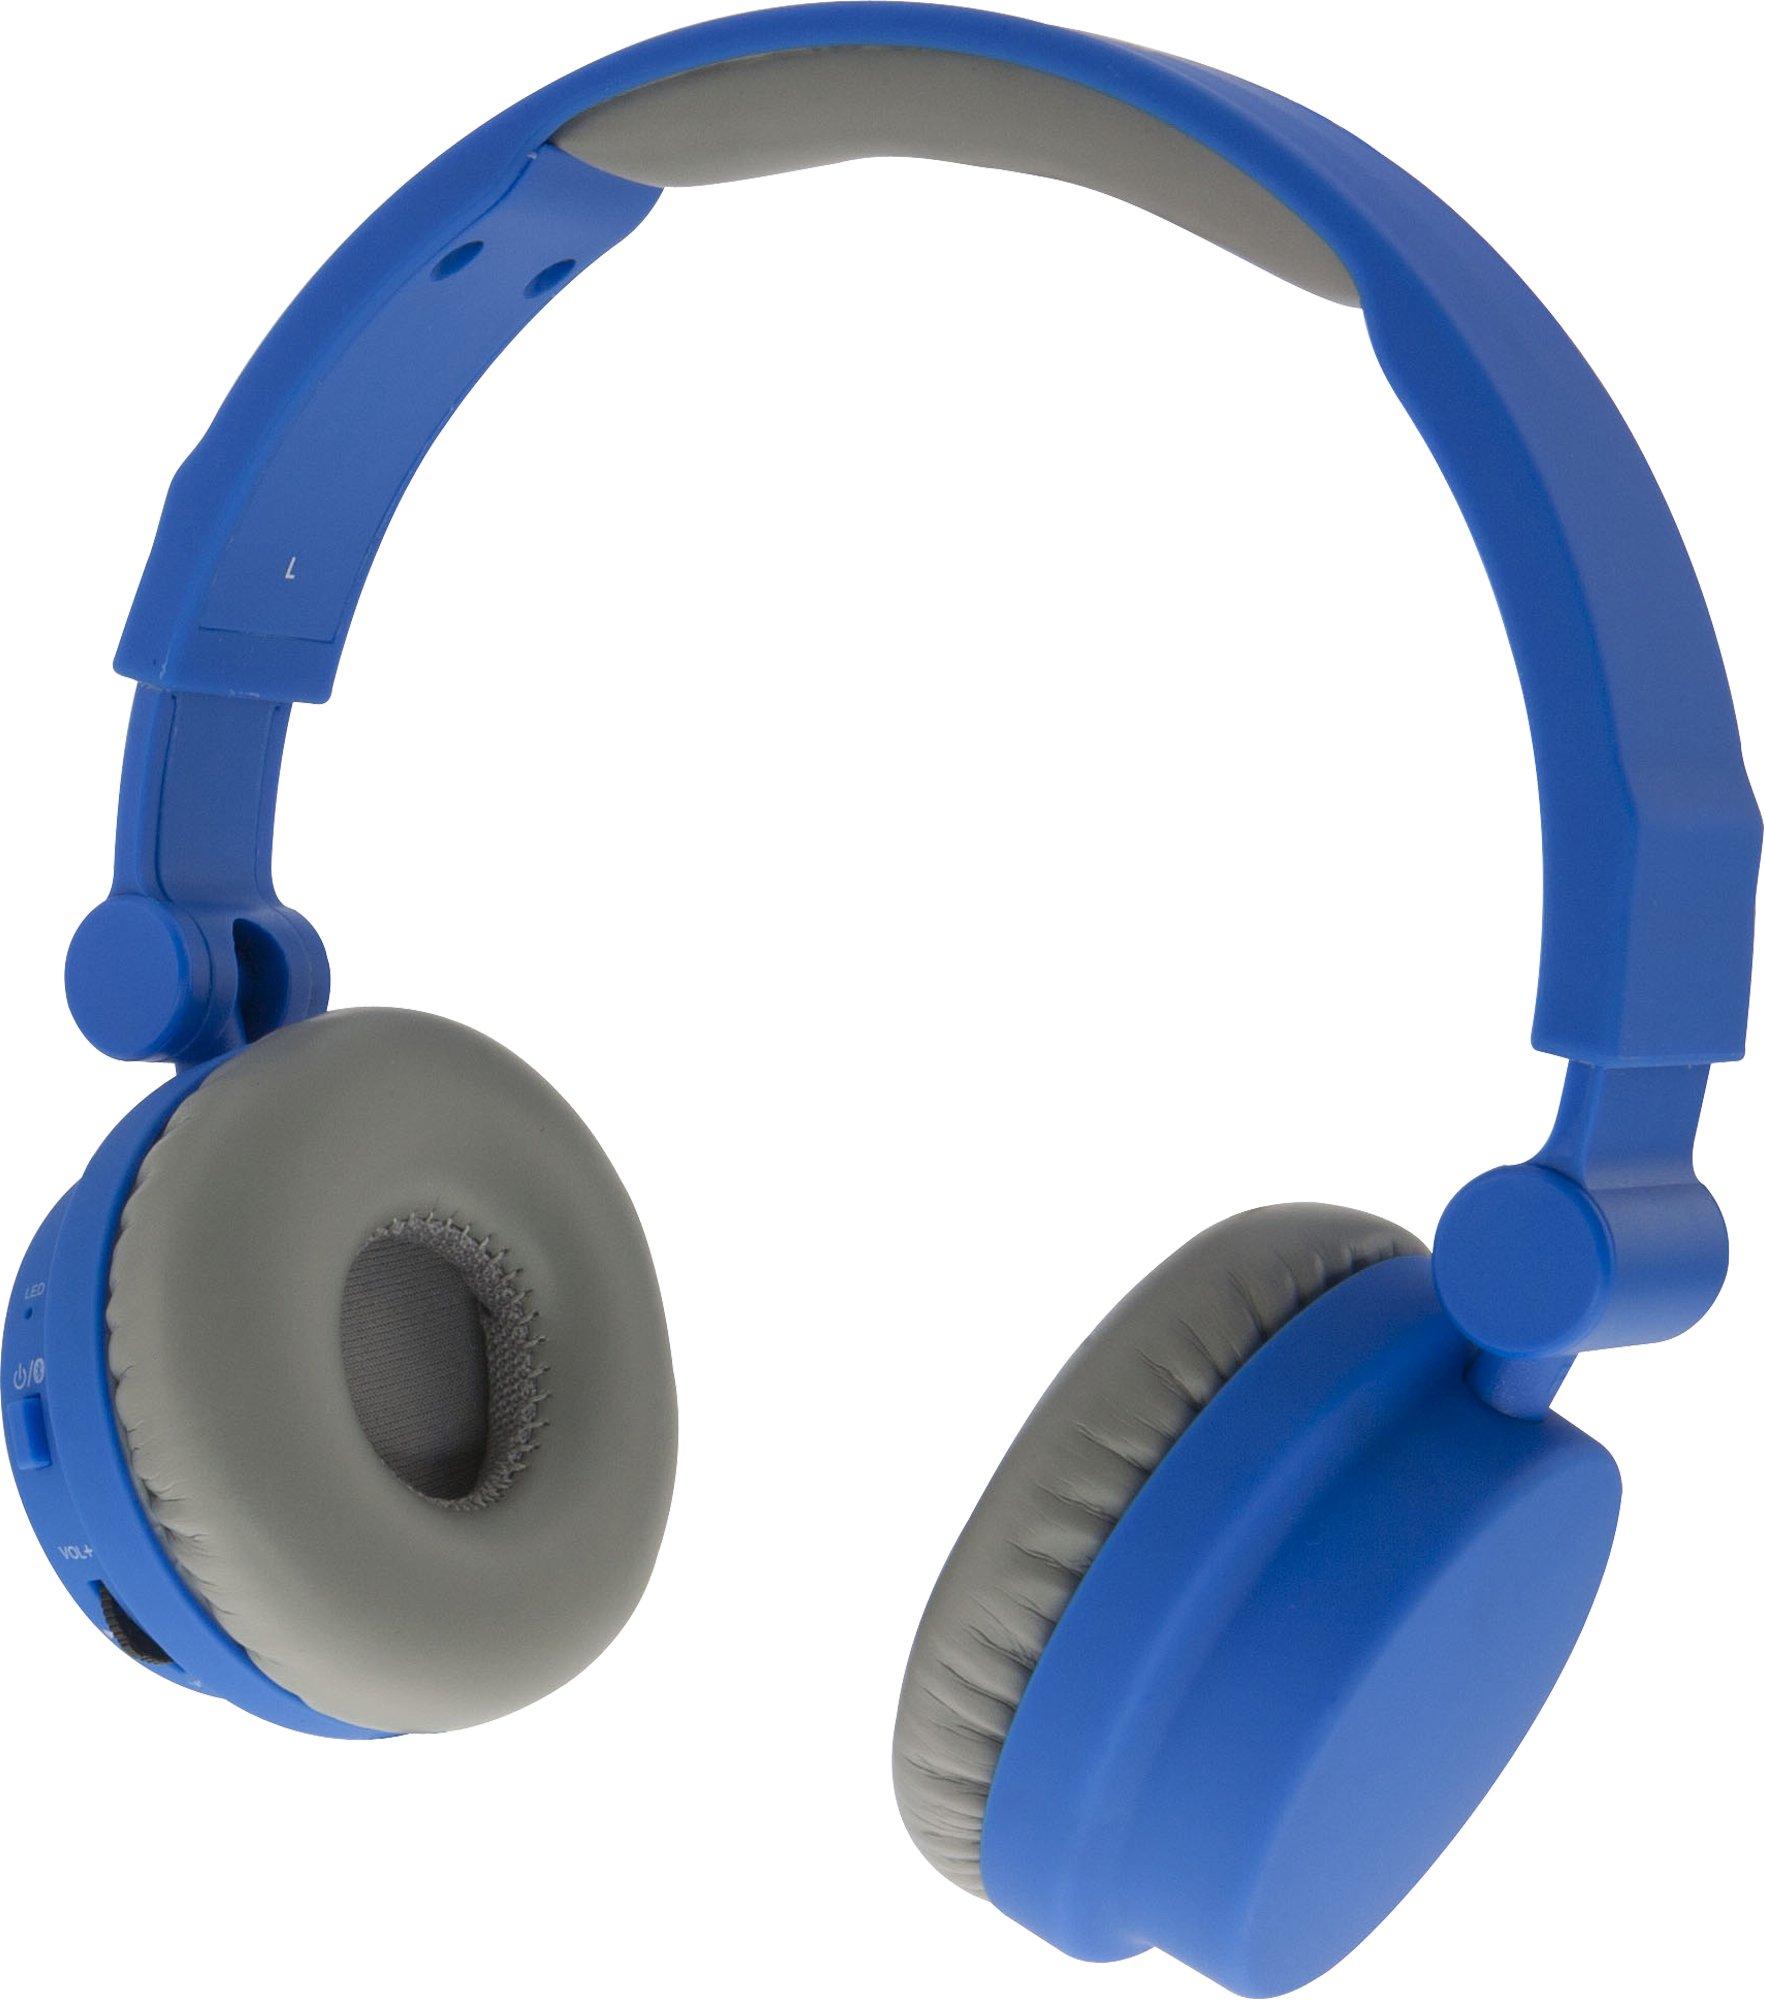 iLive iAHBT45BU On-Ear Wireless Touch Headphones Matte Blue